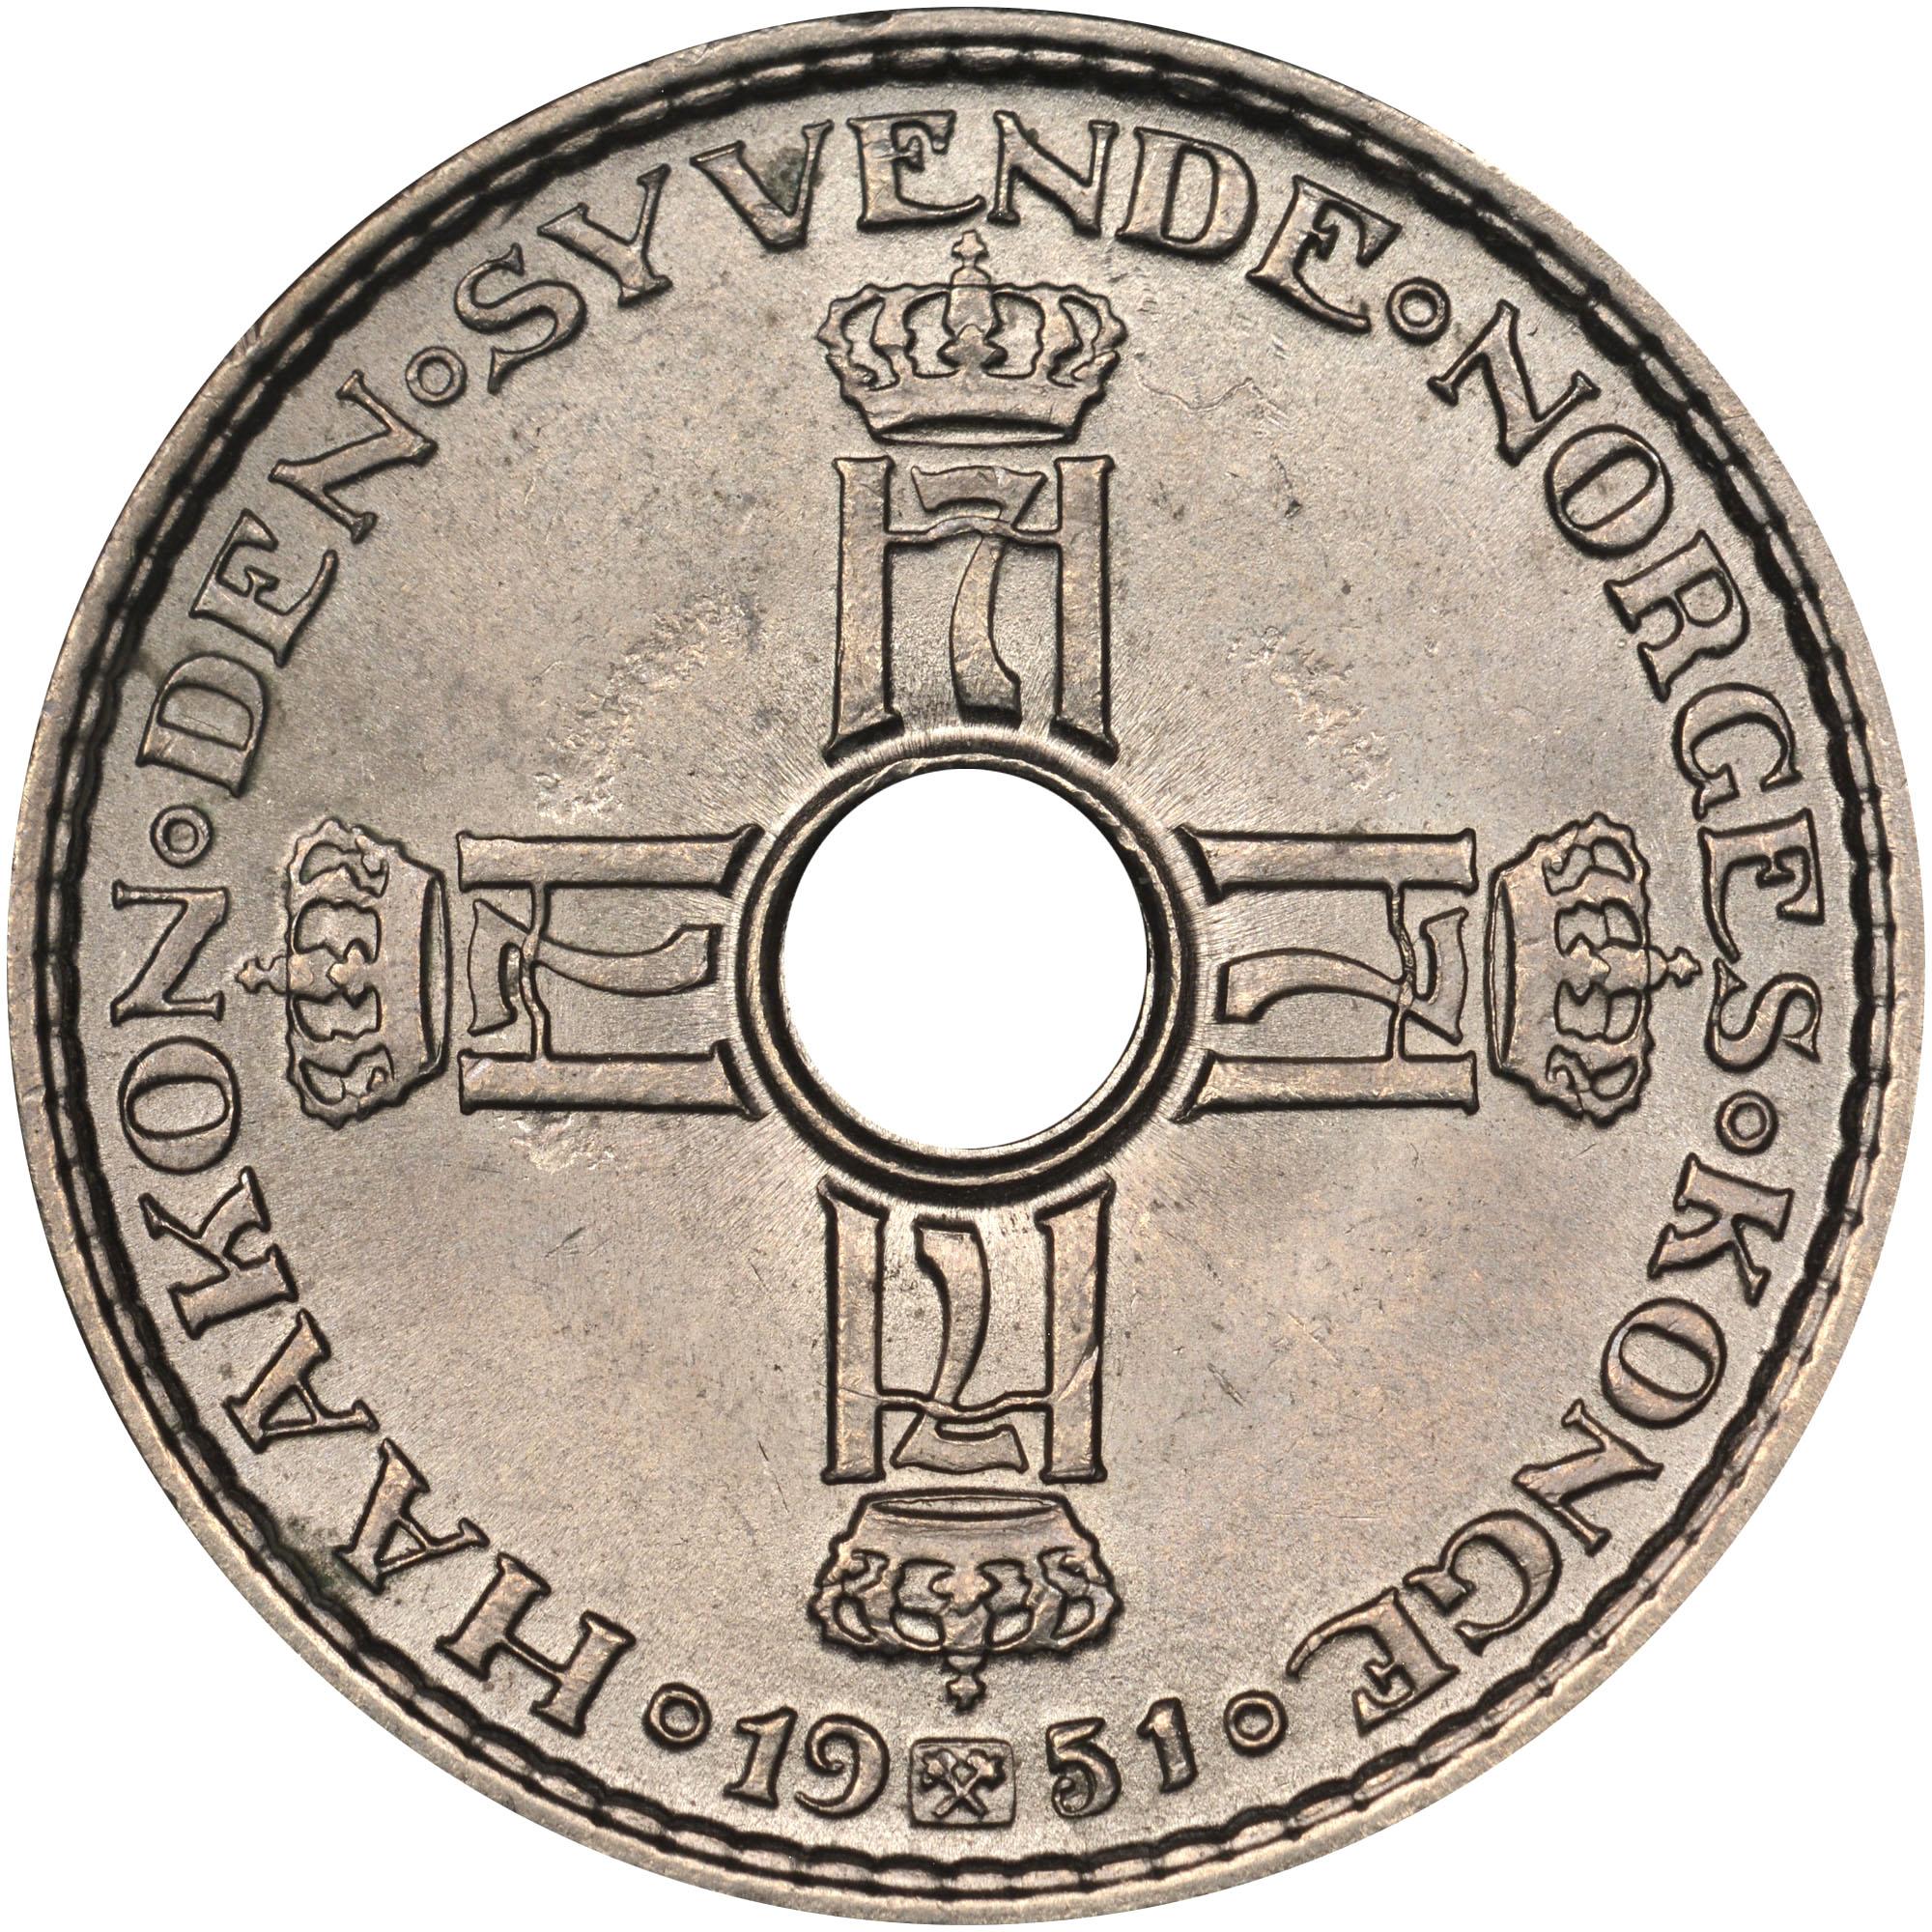 Norway Krone Km 385 Prices Values Ngc